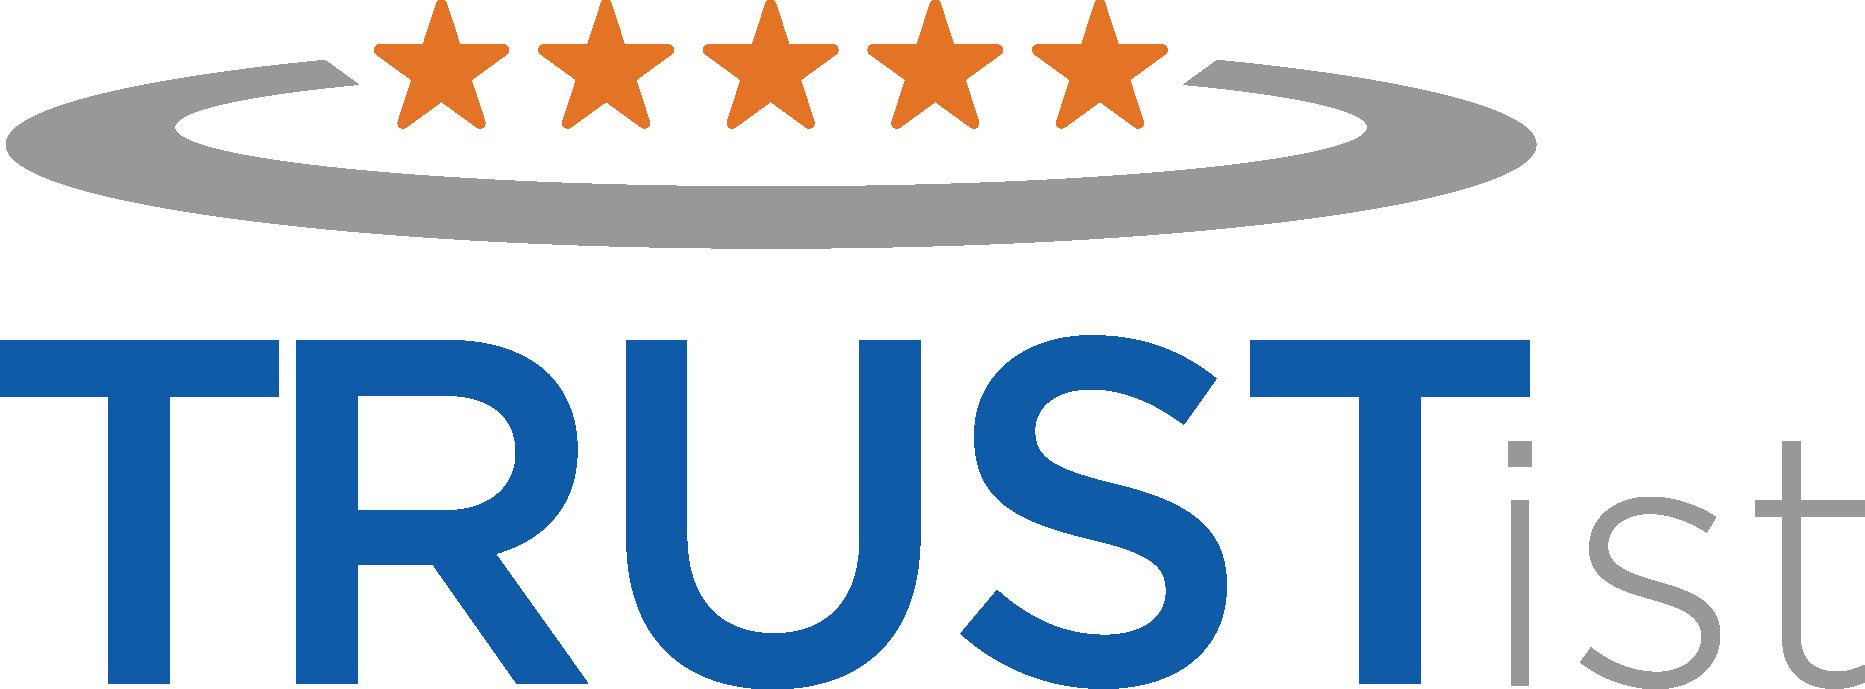 5-star-ciustomer-reviews-building-services-richmond